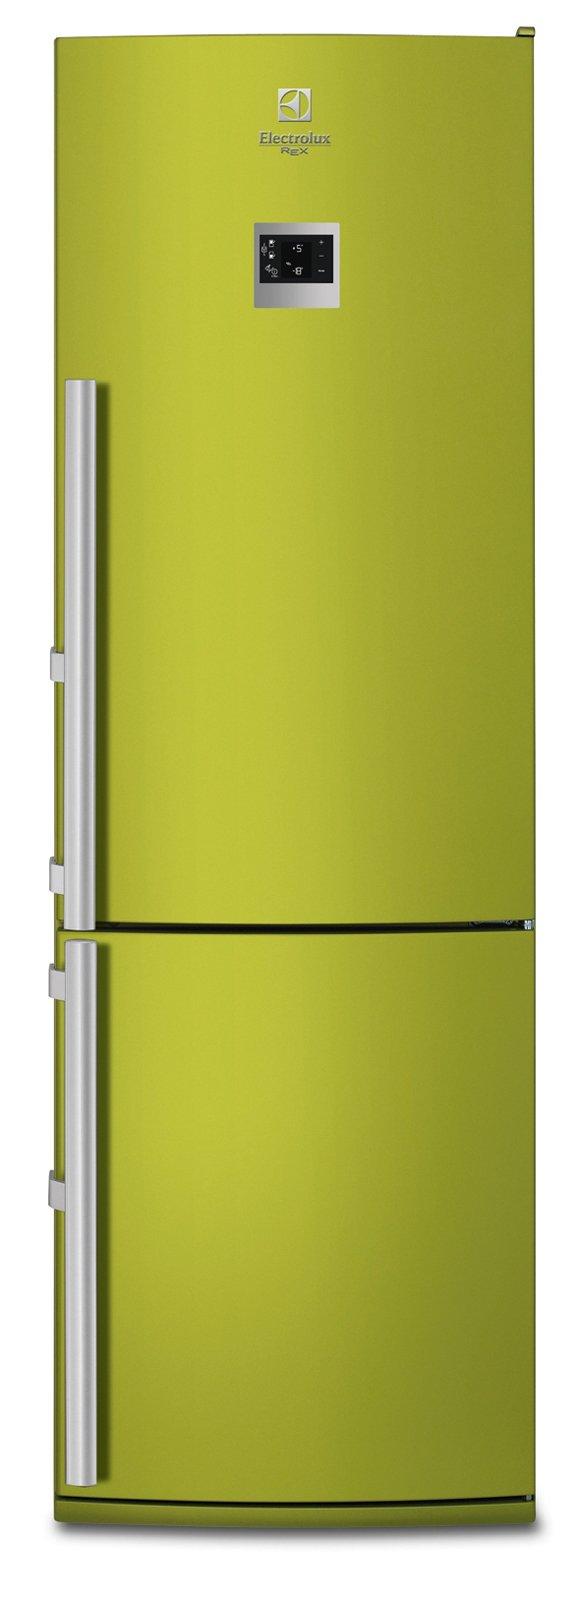 Electroluxrex rn3487aoj frigo cose di casa for Frigoriferi profondita